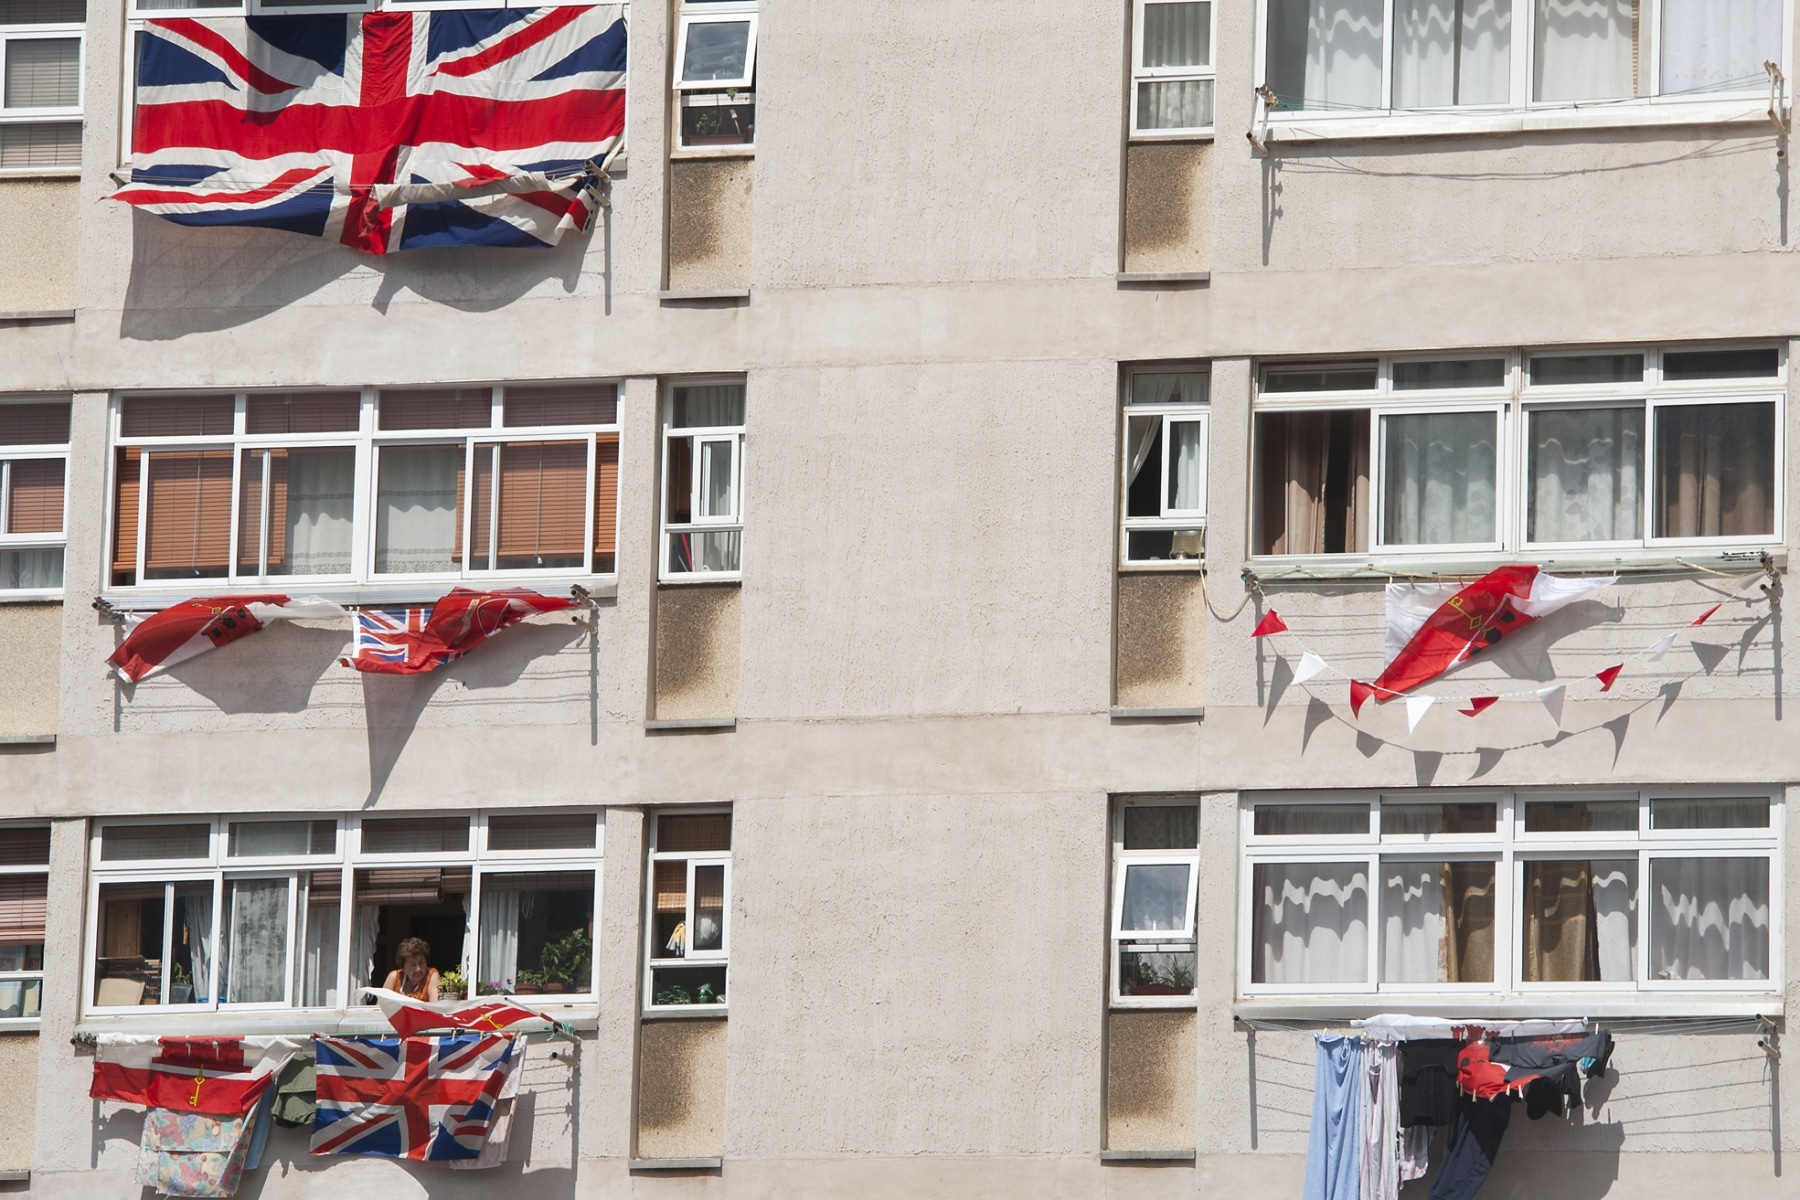 gibraltar-national-day_037_9719726094_o